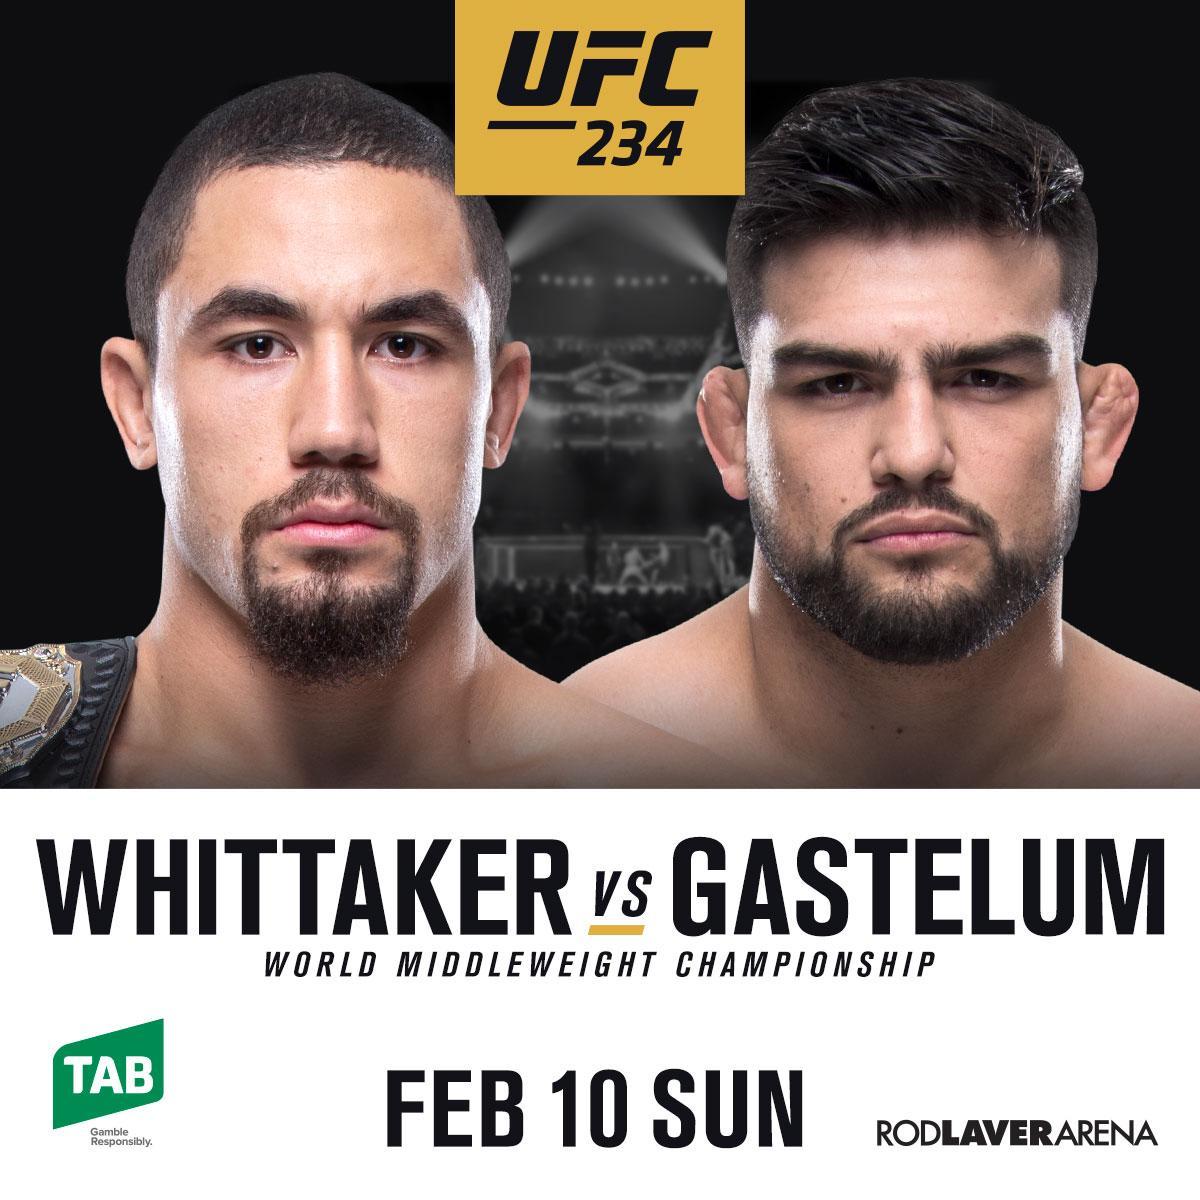 11cc219d89f UFC Aus/New Zealand's tweet -